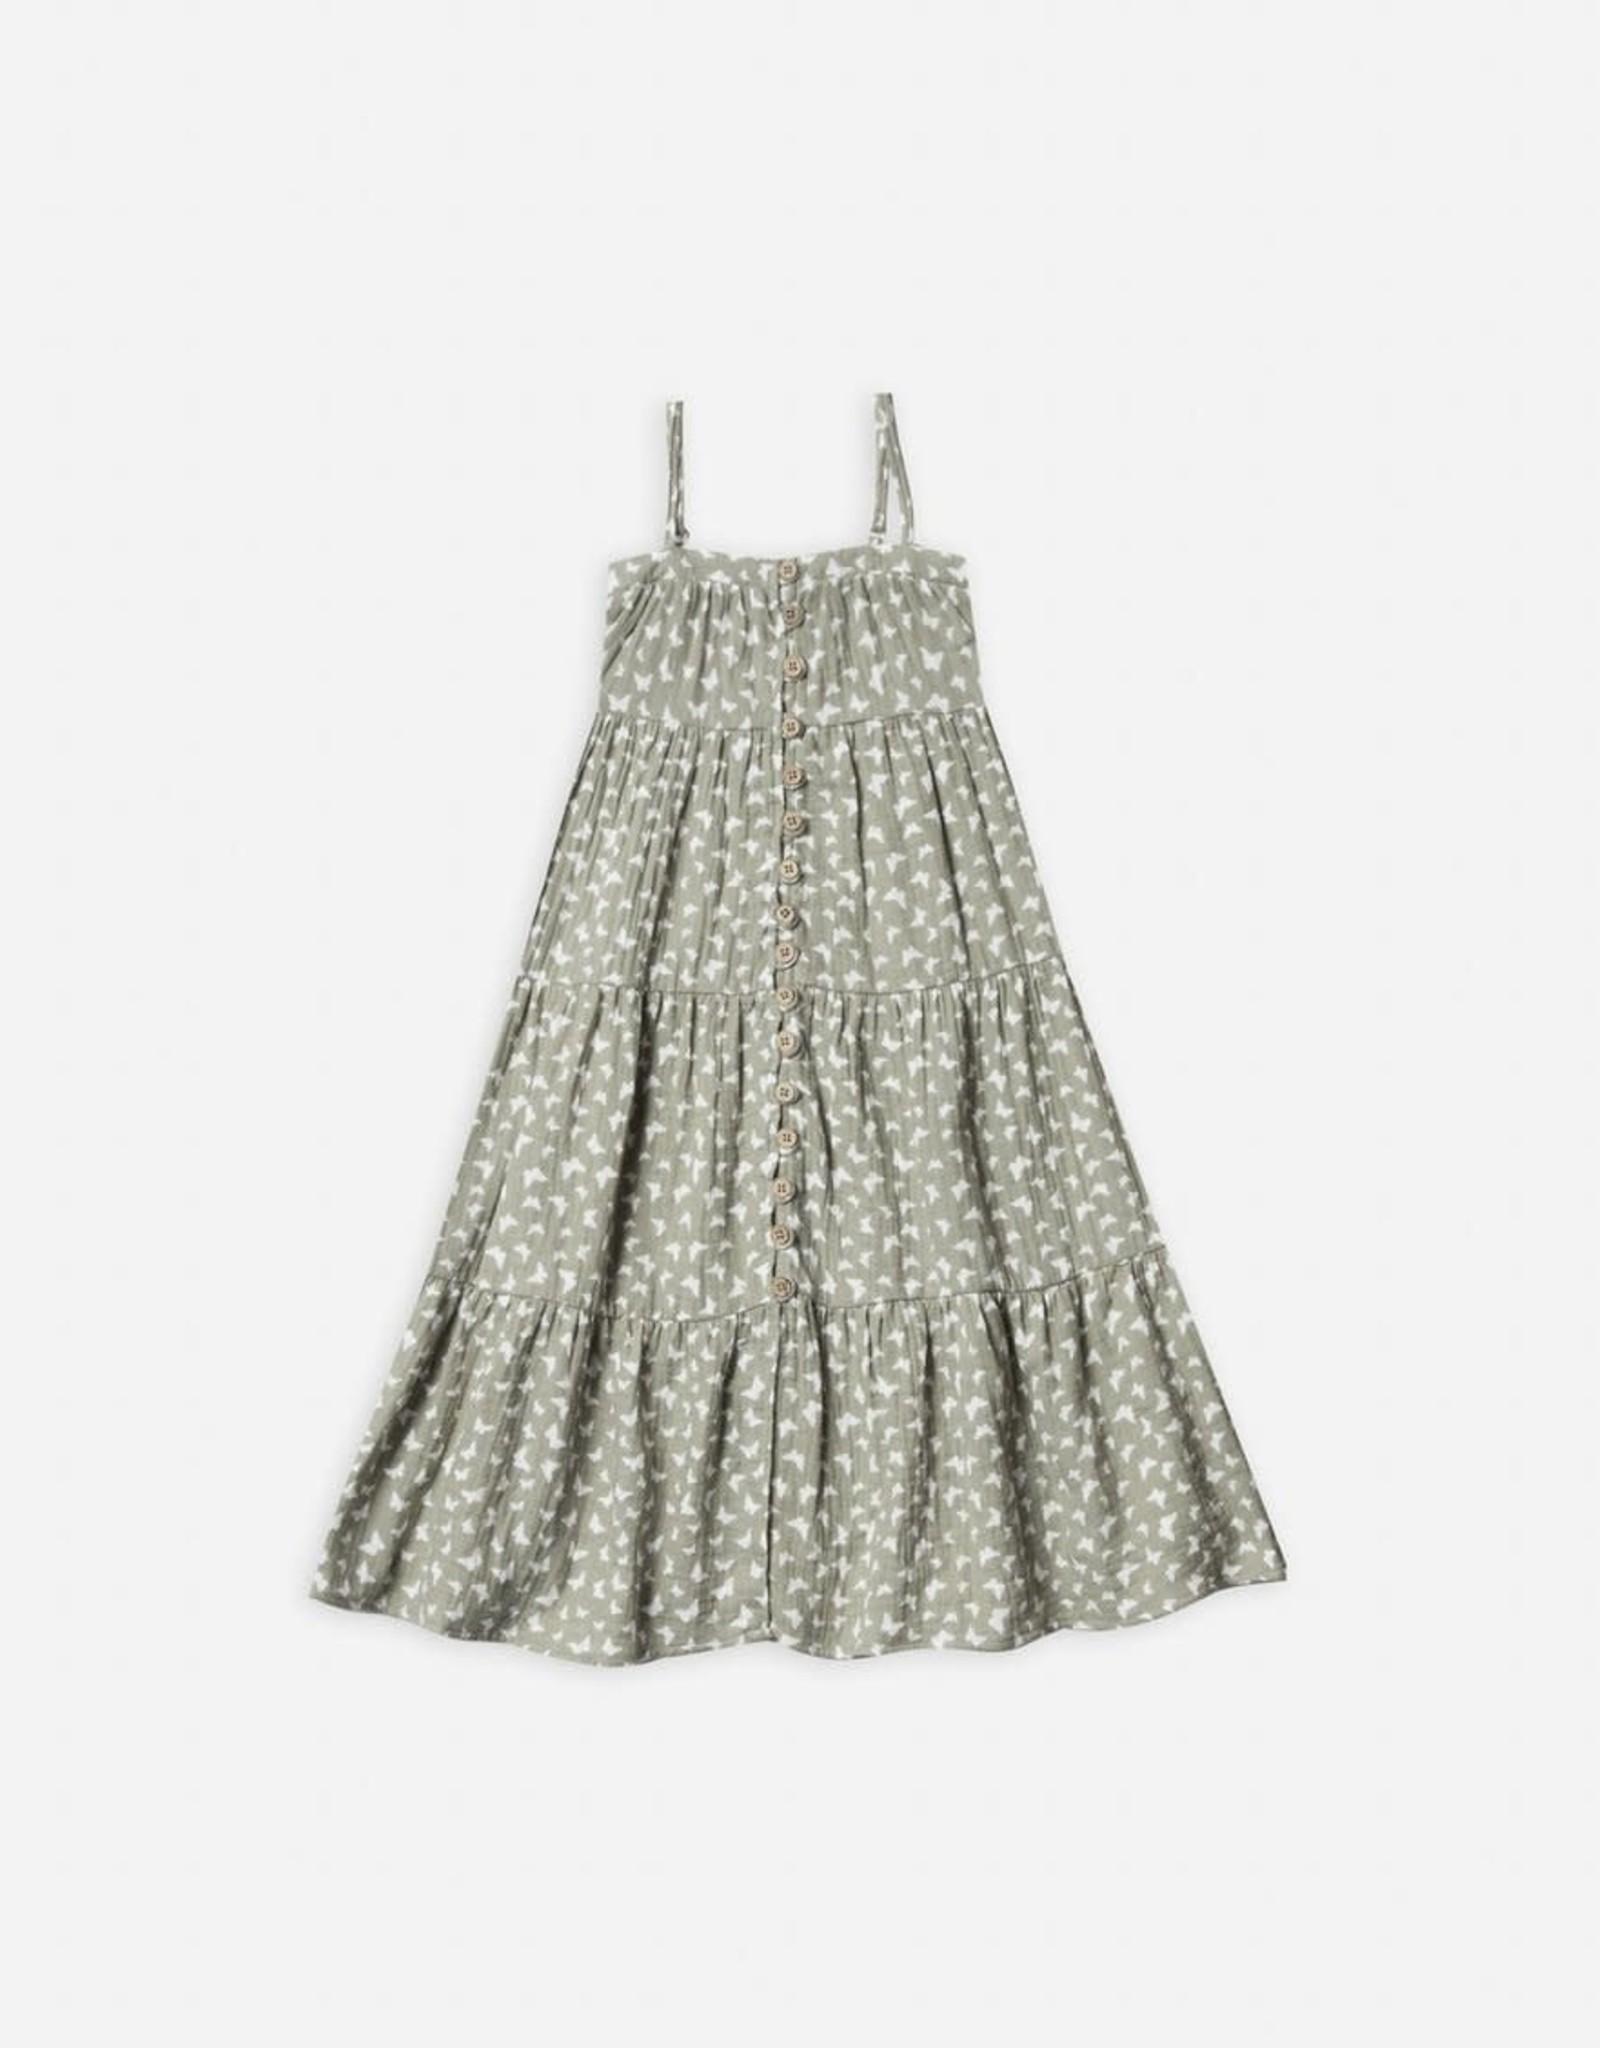 Rylee & Cru Rylee & Cru Butterfly Tiered Maxi Dress